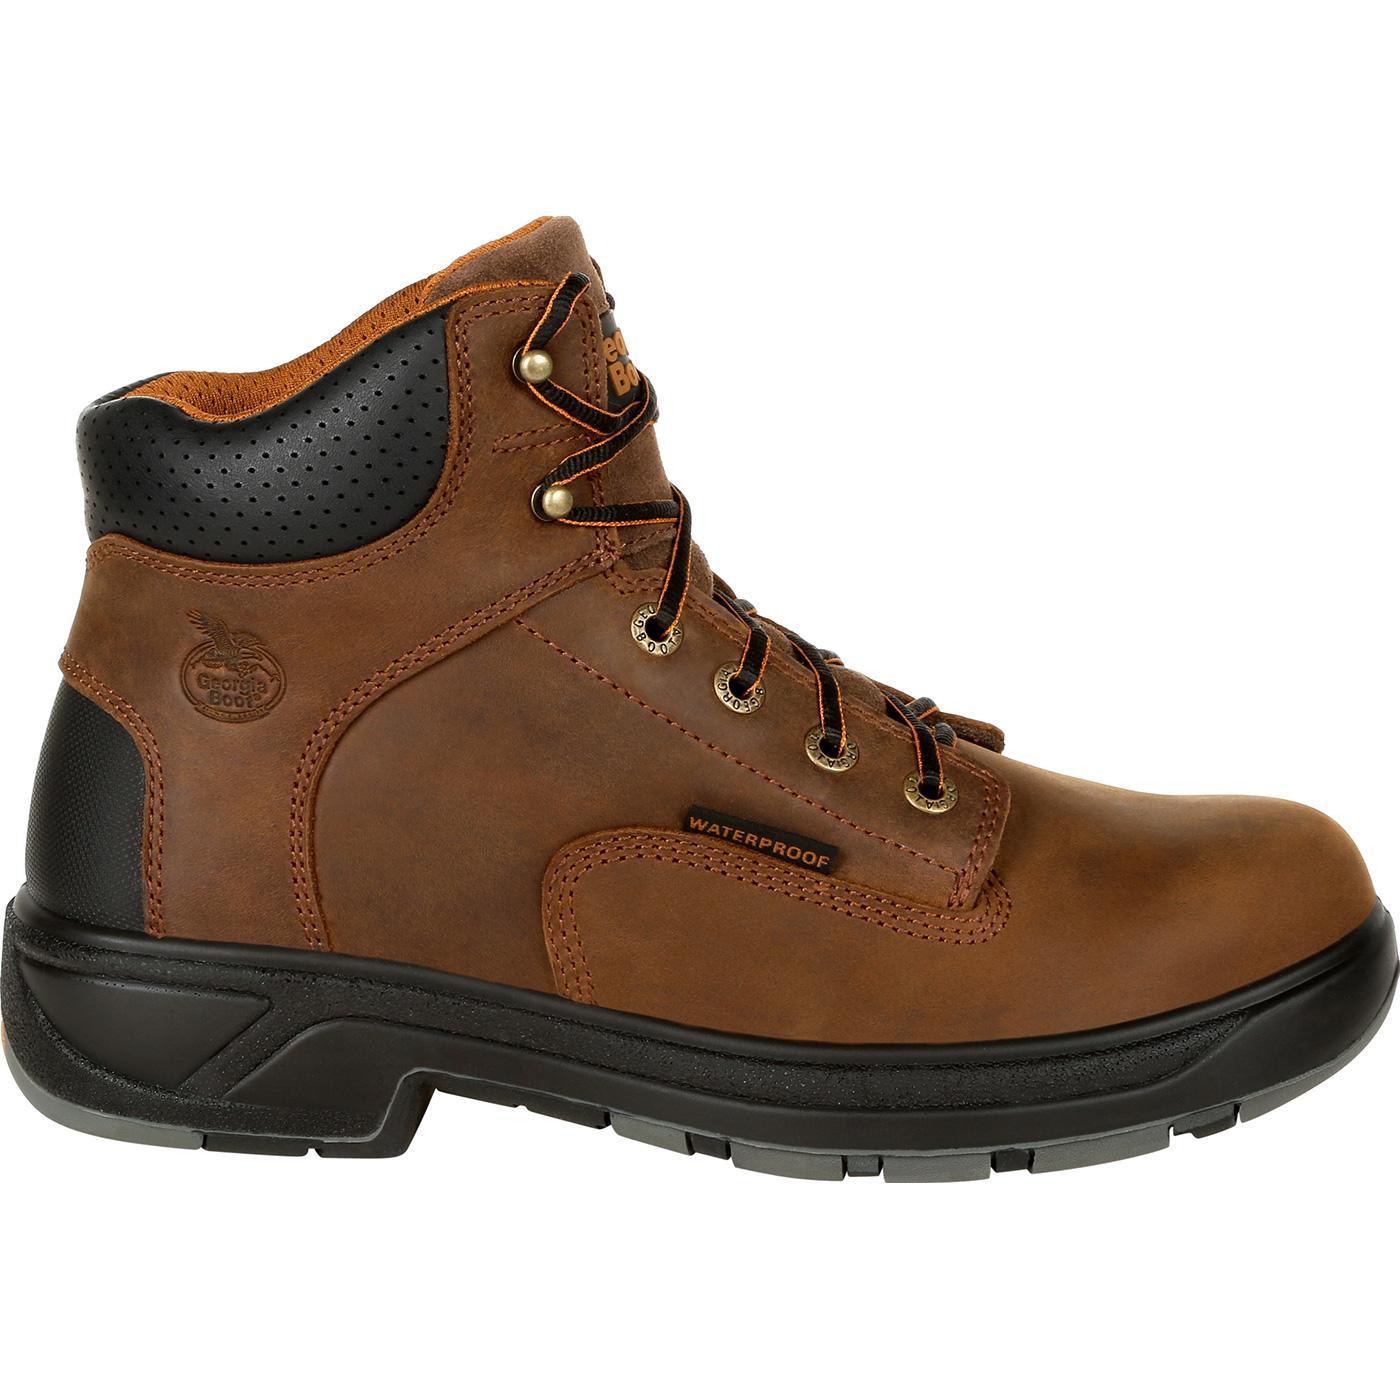 8b81669833e Georgia Boot FLXpoint Waterproof Work Boot